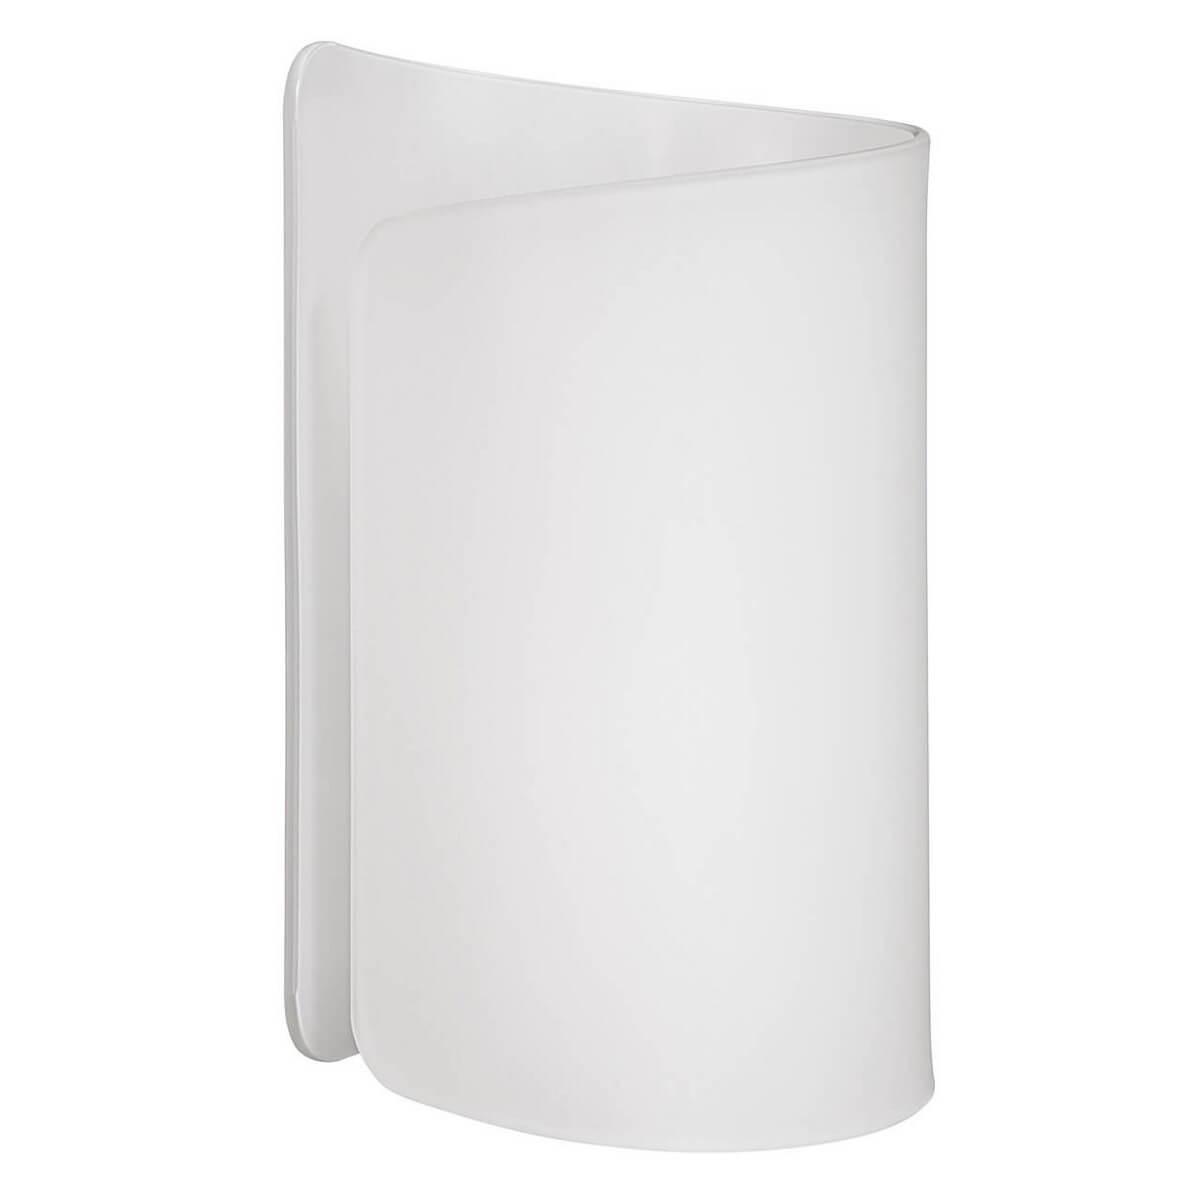 Настенный светильник Lightstar 811610, E27, 40 Вт настенный светильник бра коллекция pittore 811610 белый lightstar лайтстар